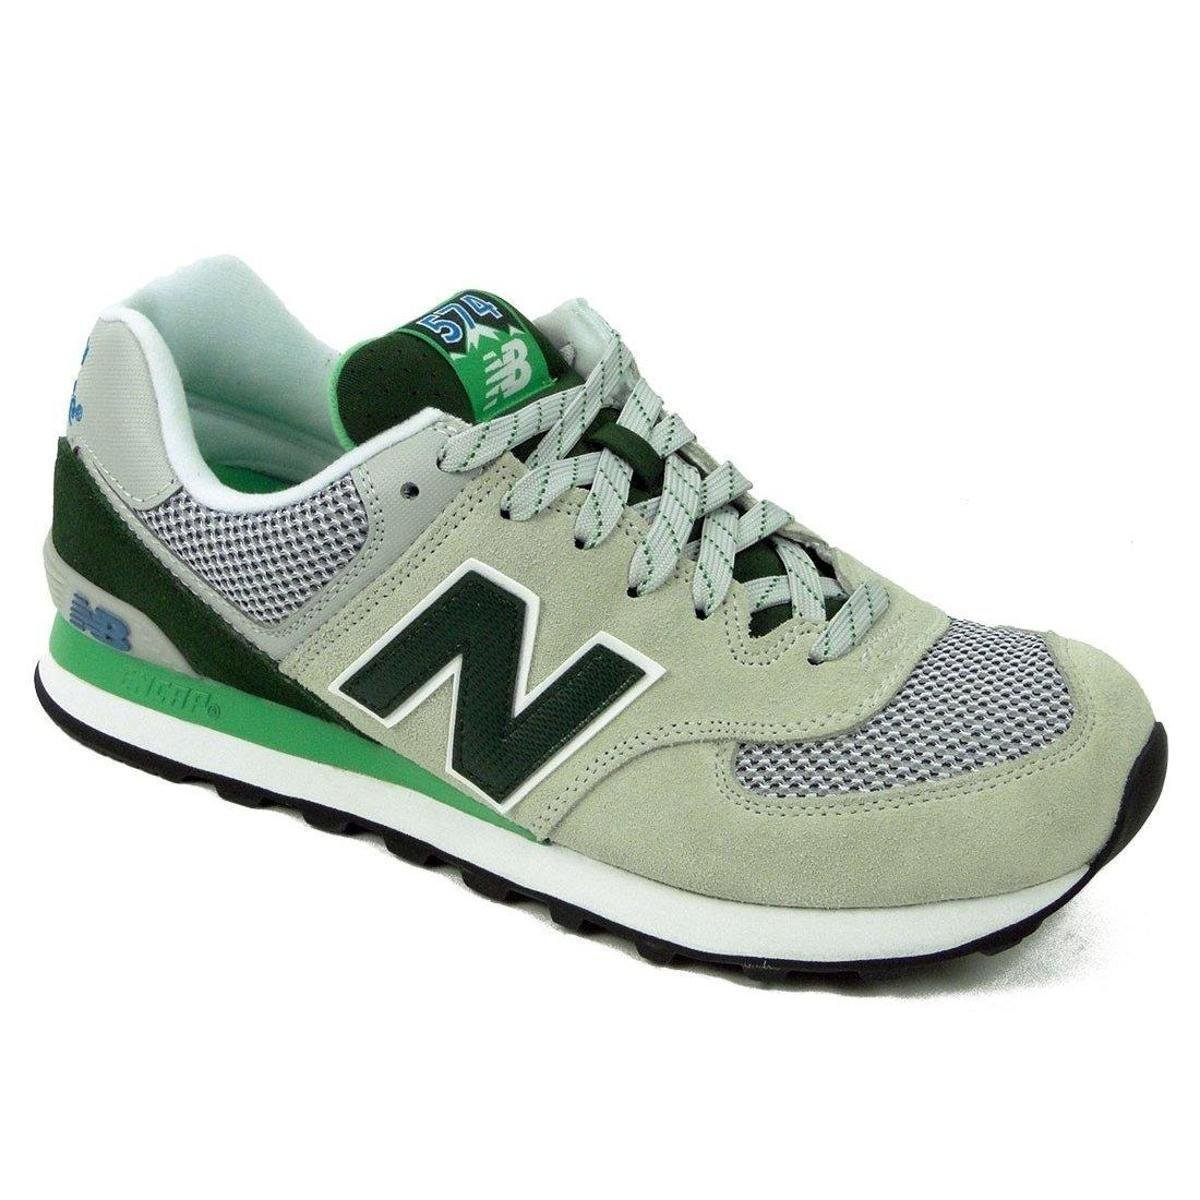 new balance 574 cinza e verde